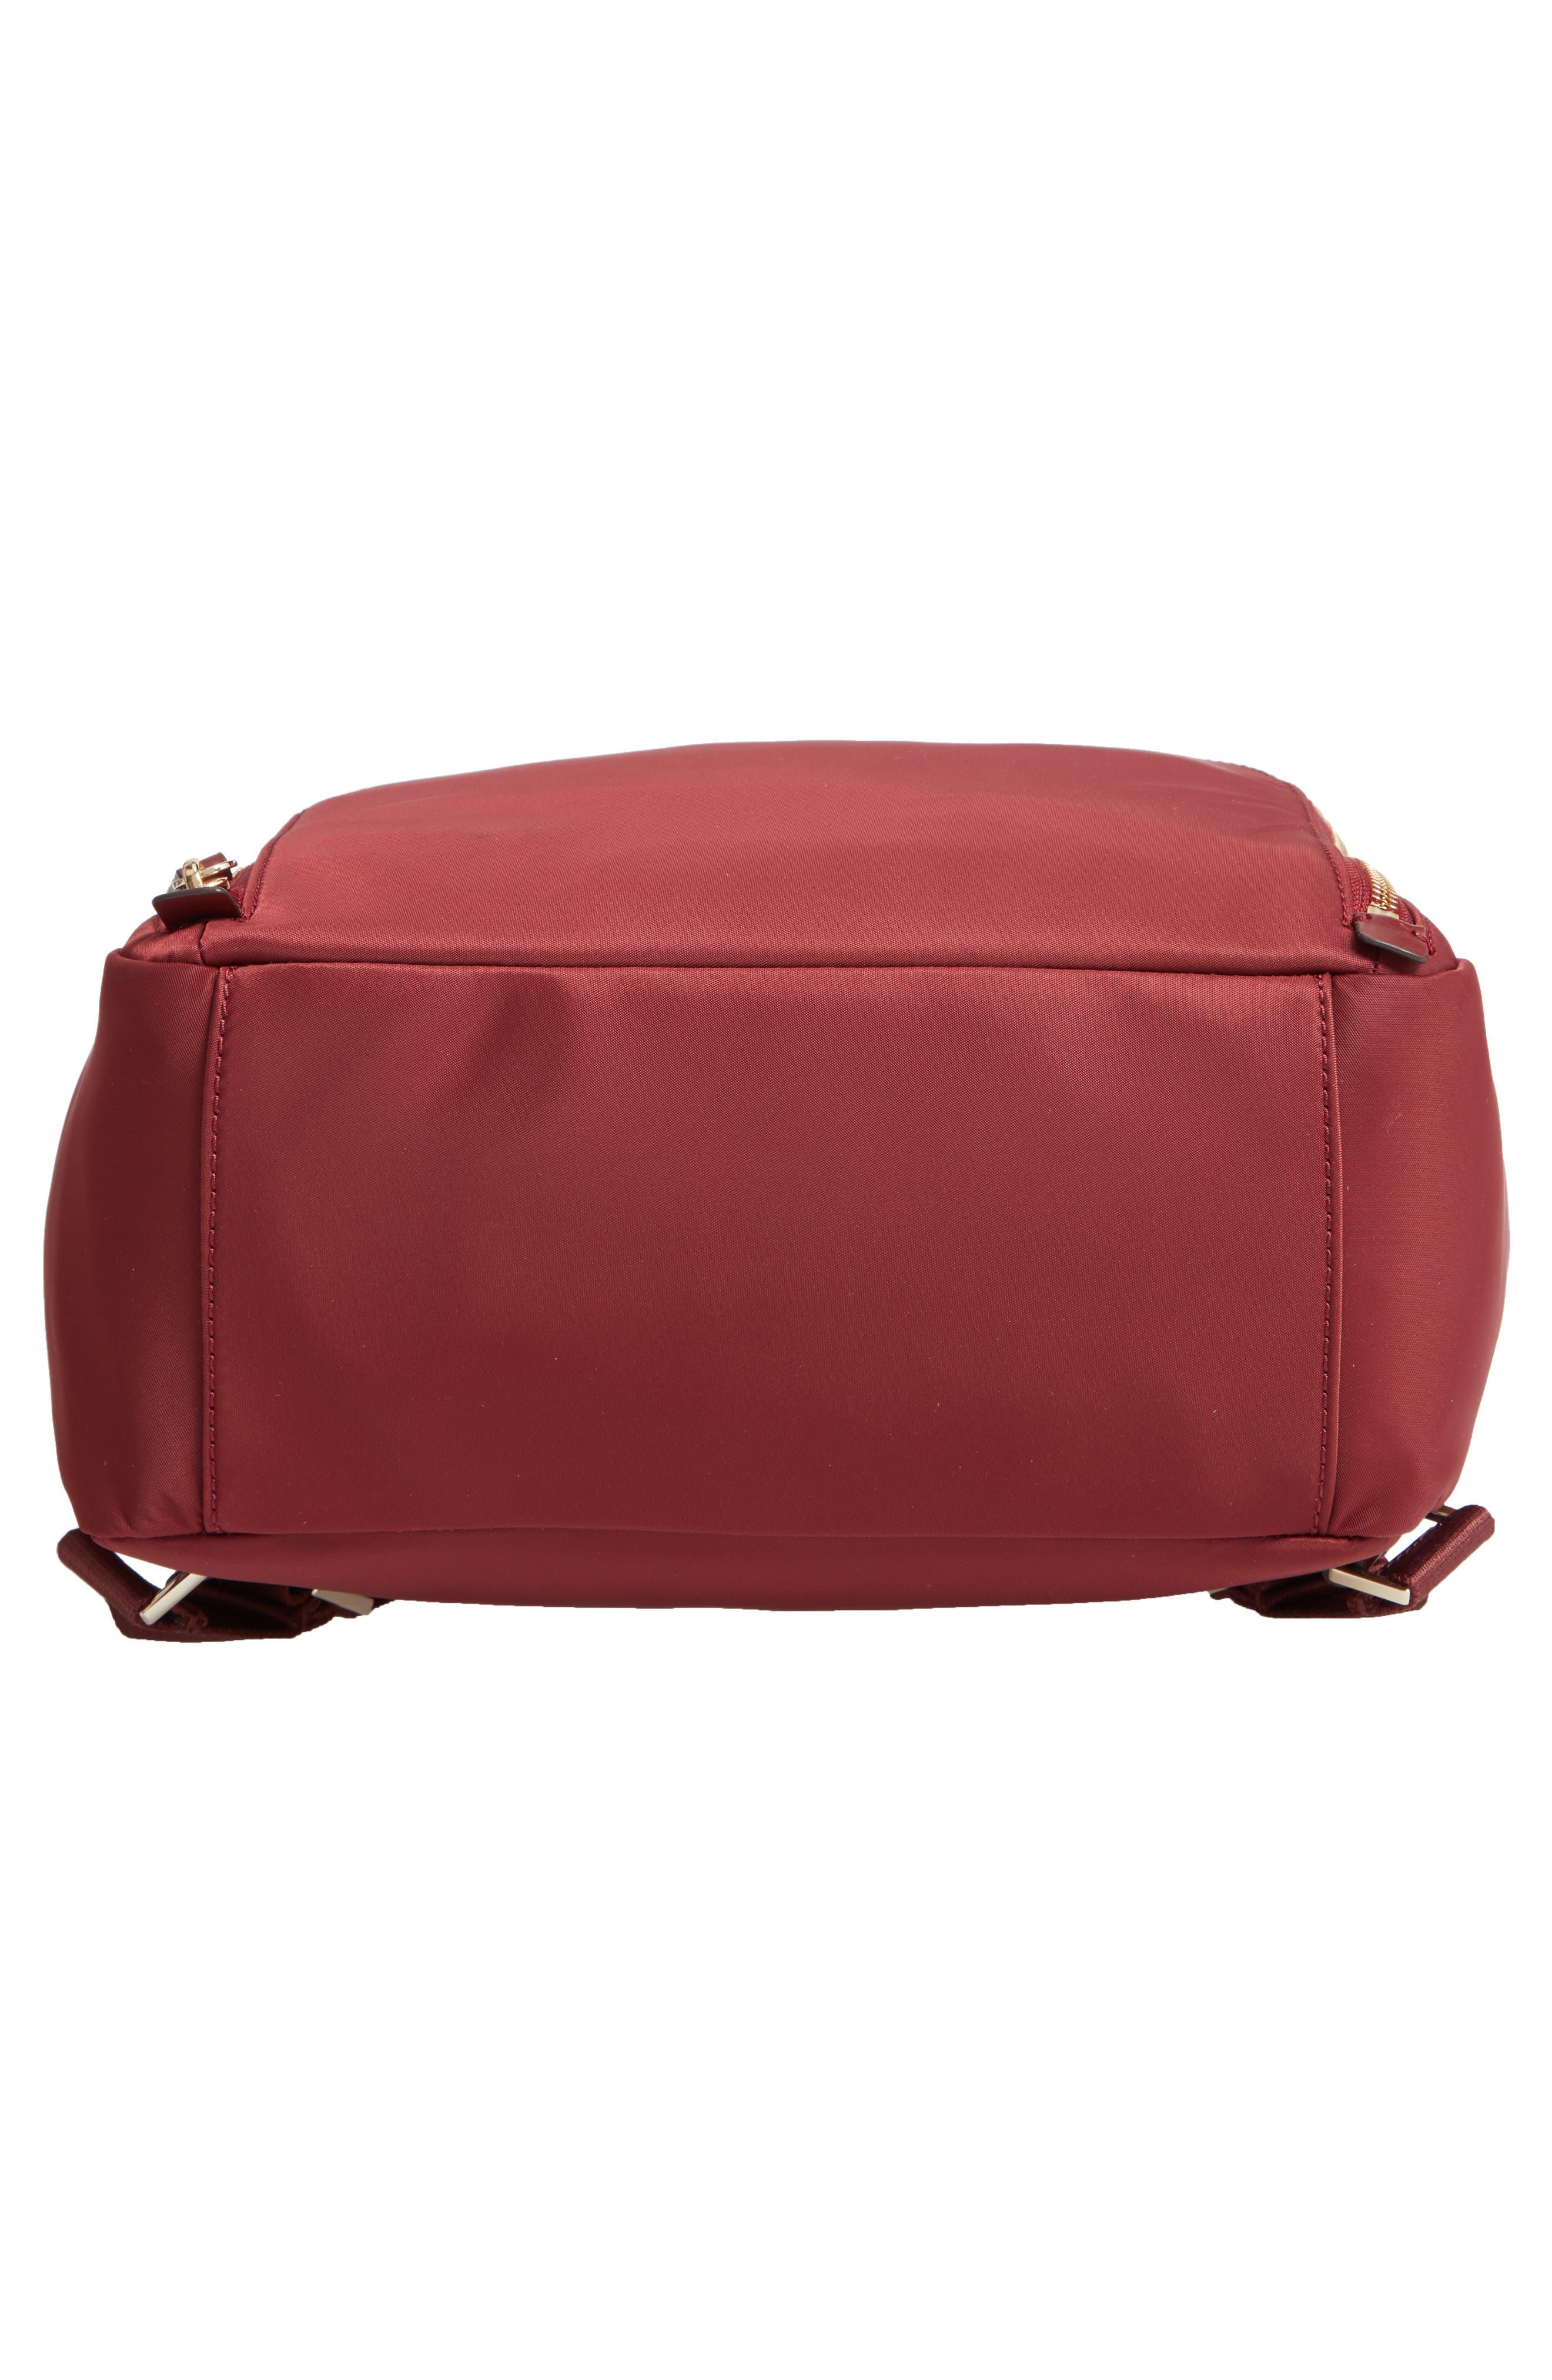 watson lane - hartley nylon backpack,                             Alternate thumbnail 6, color,                             DARK CURRANT